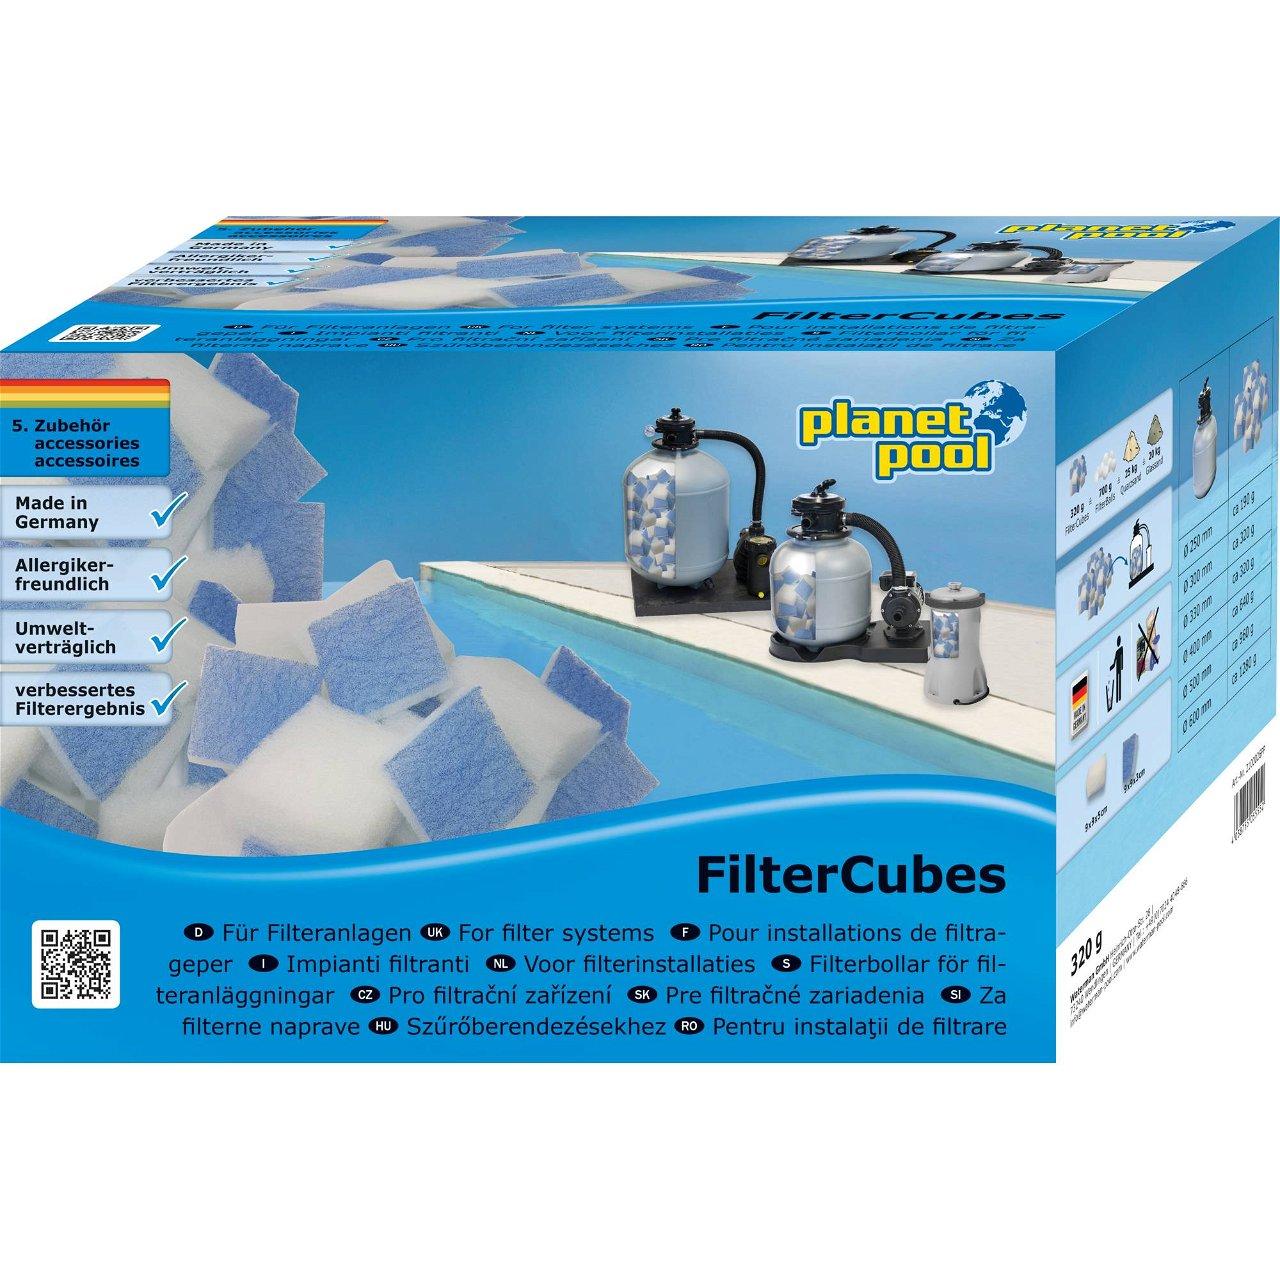 Filtercubes 320g, Planet Pool